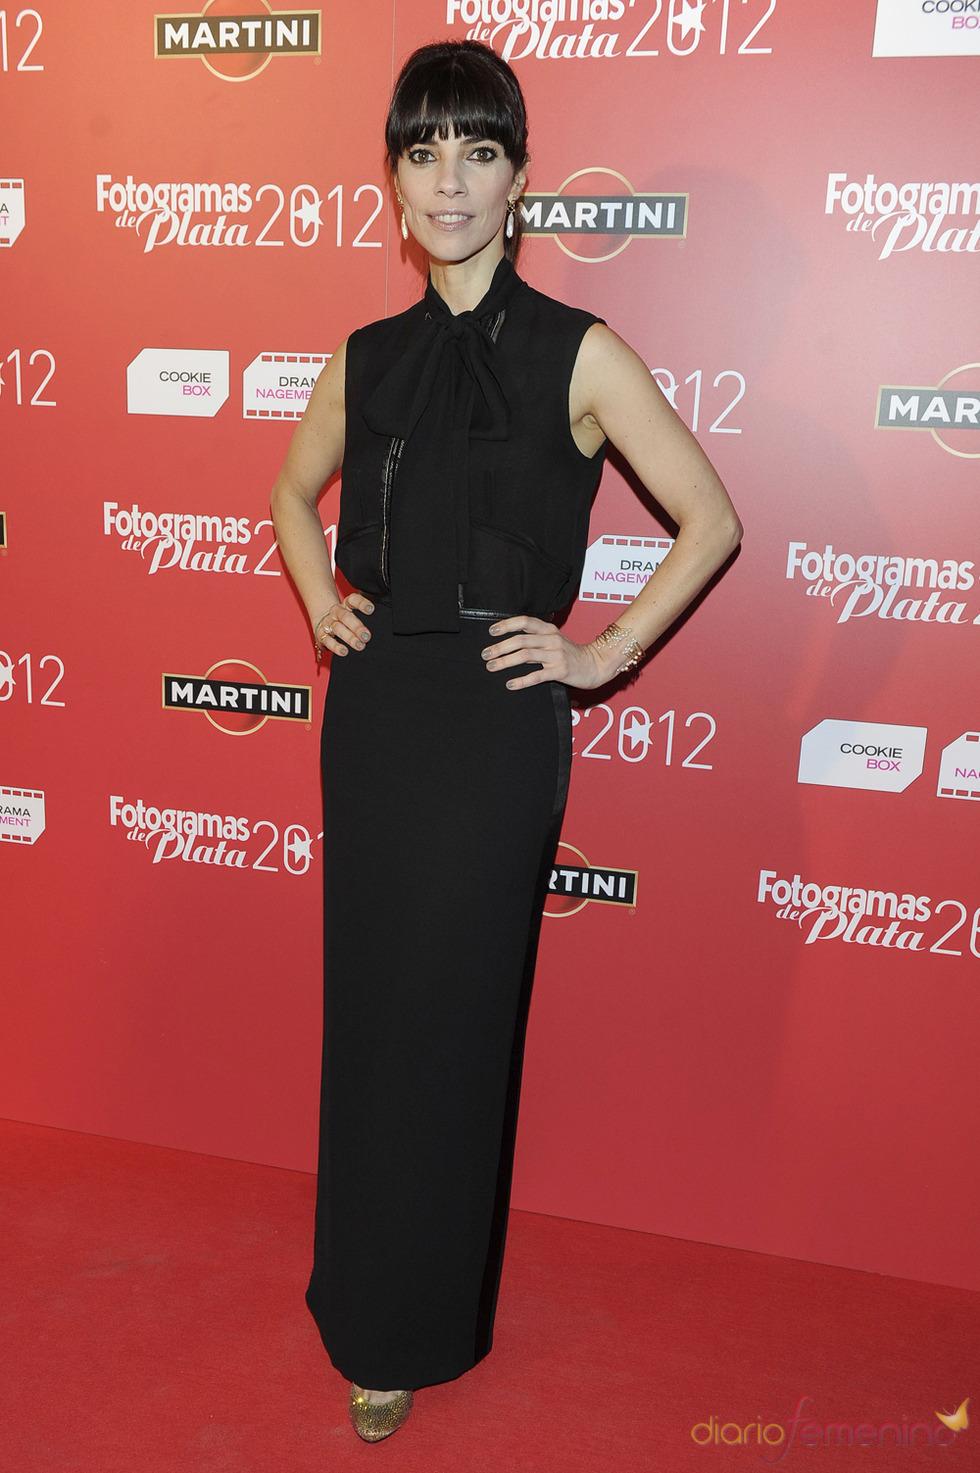 Maribel Verdú en la alfombra roja de los Fotogramas 2012